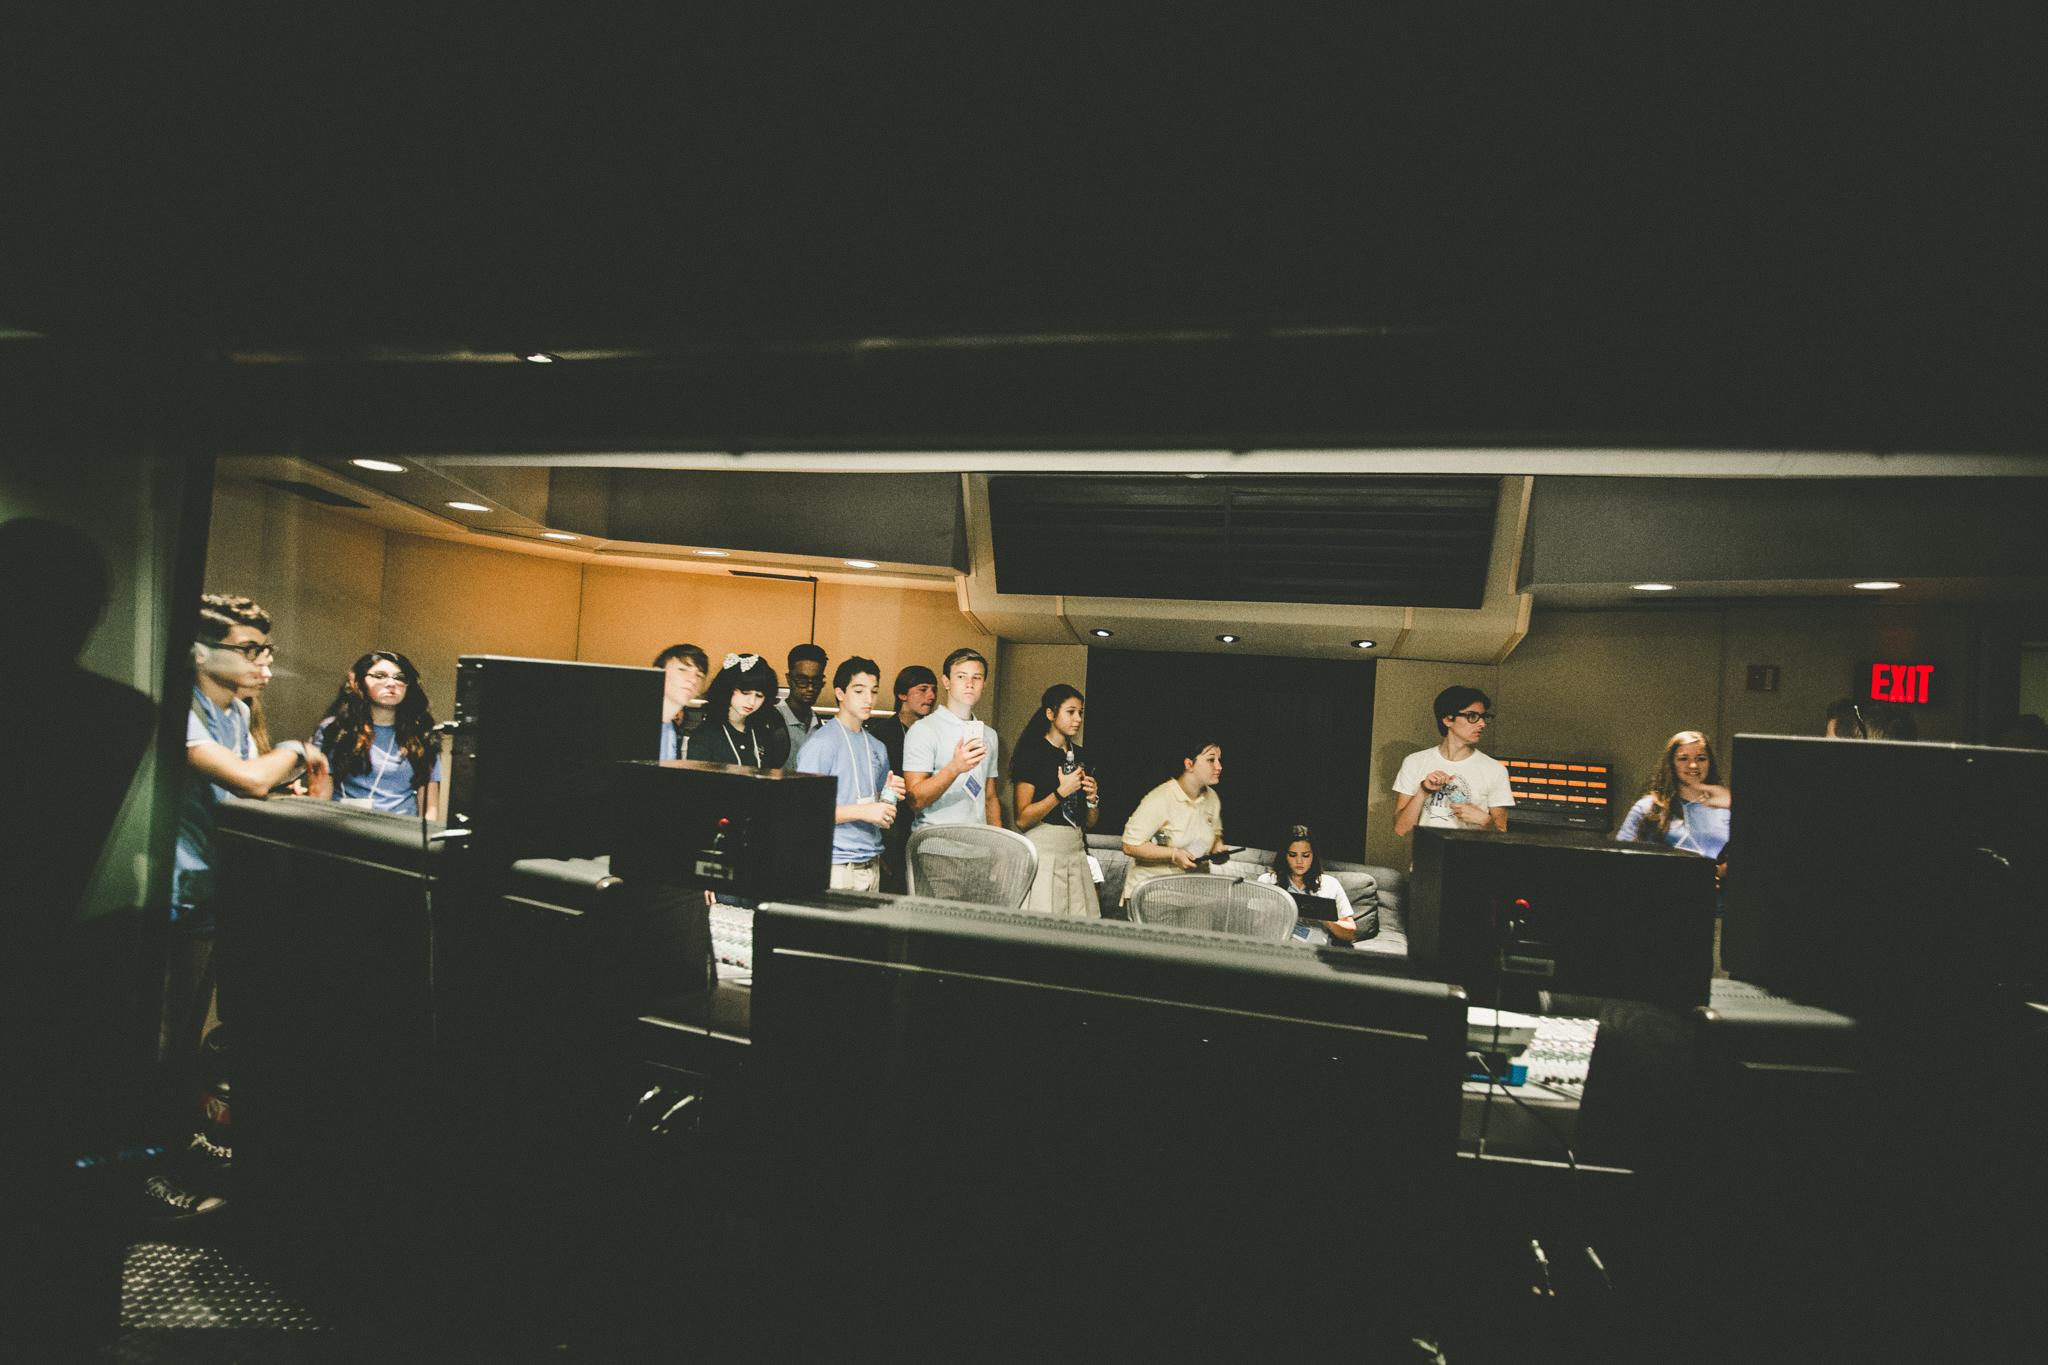 FS_LABS_One_School_of_the_Arts_Aug.25_11.jpg